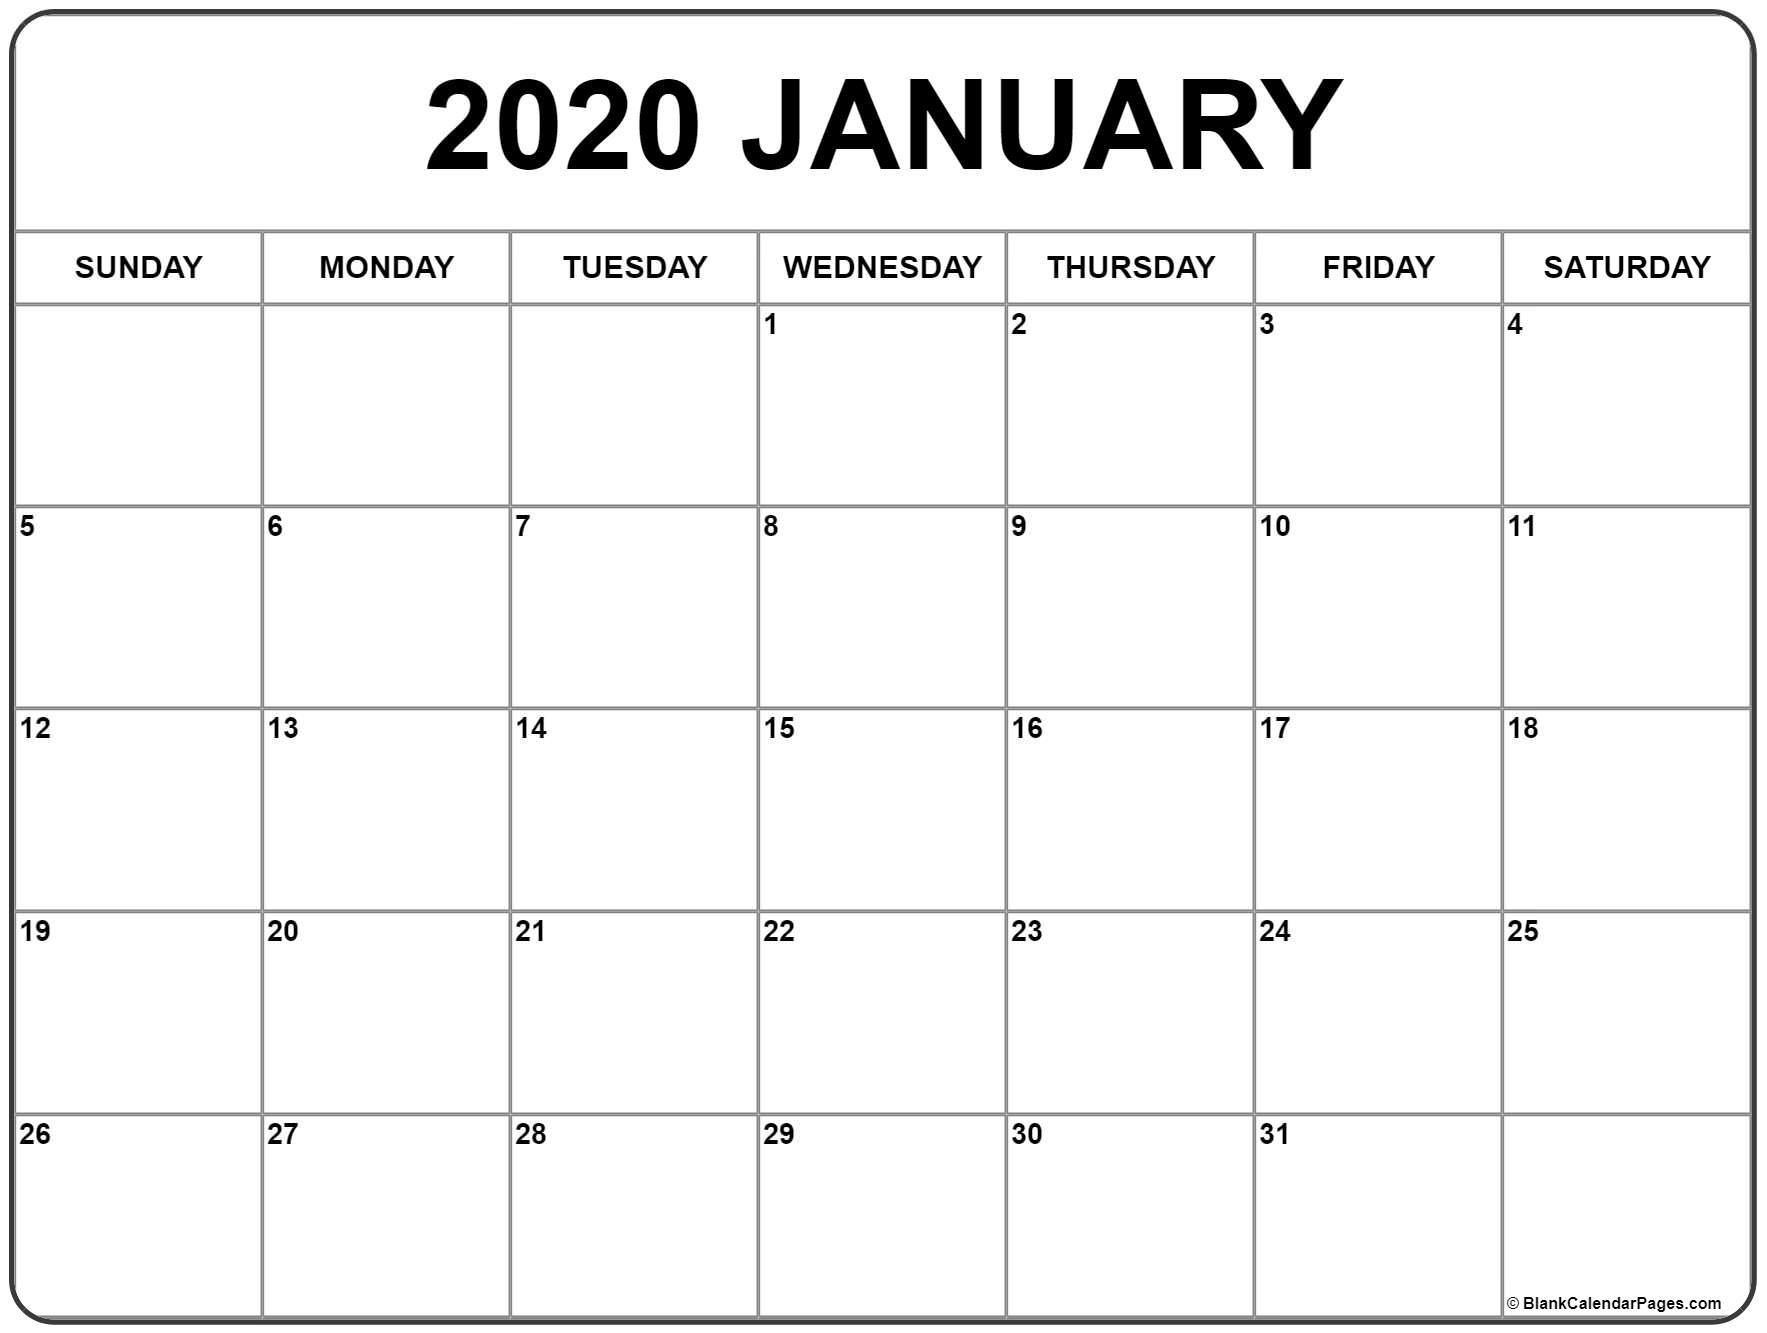 January 2020 Calendar | Free Printable Monthly Calendars inside Large Numbers Free Printable Calendar 2020